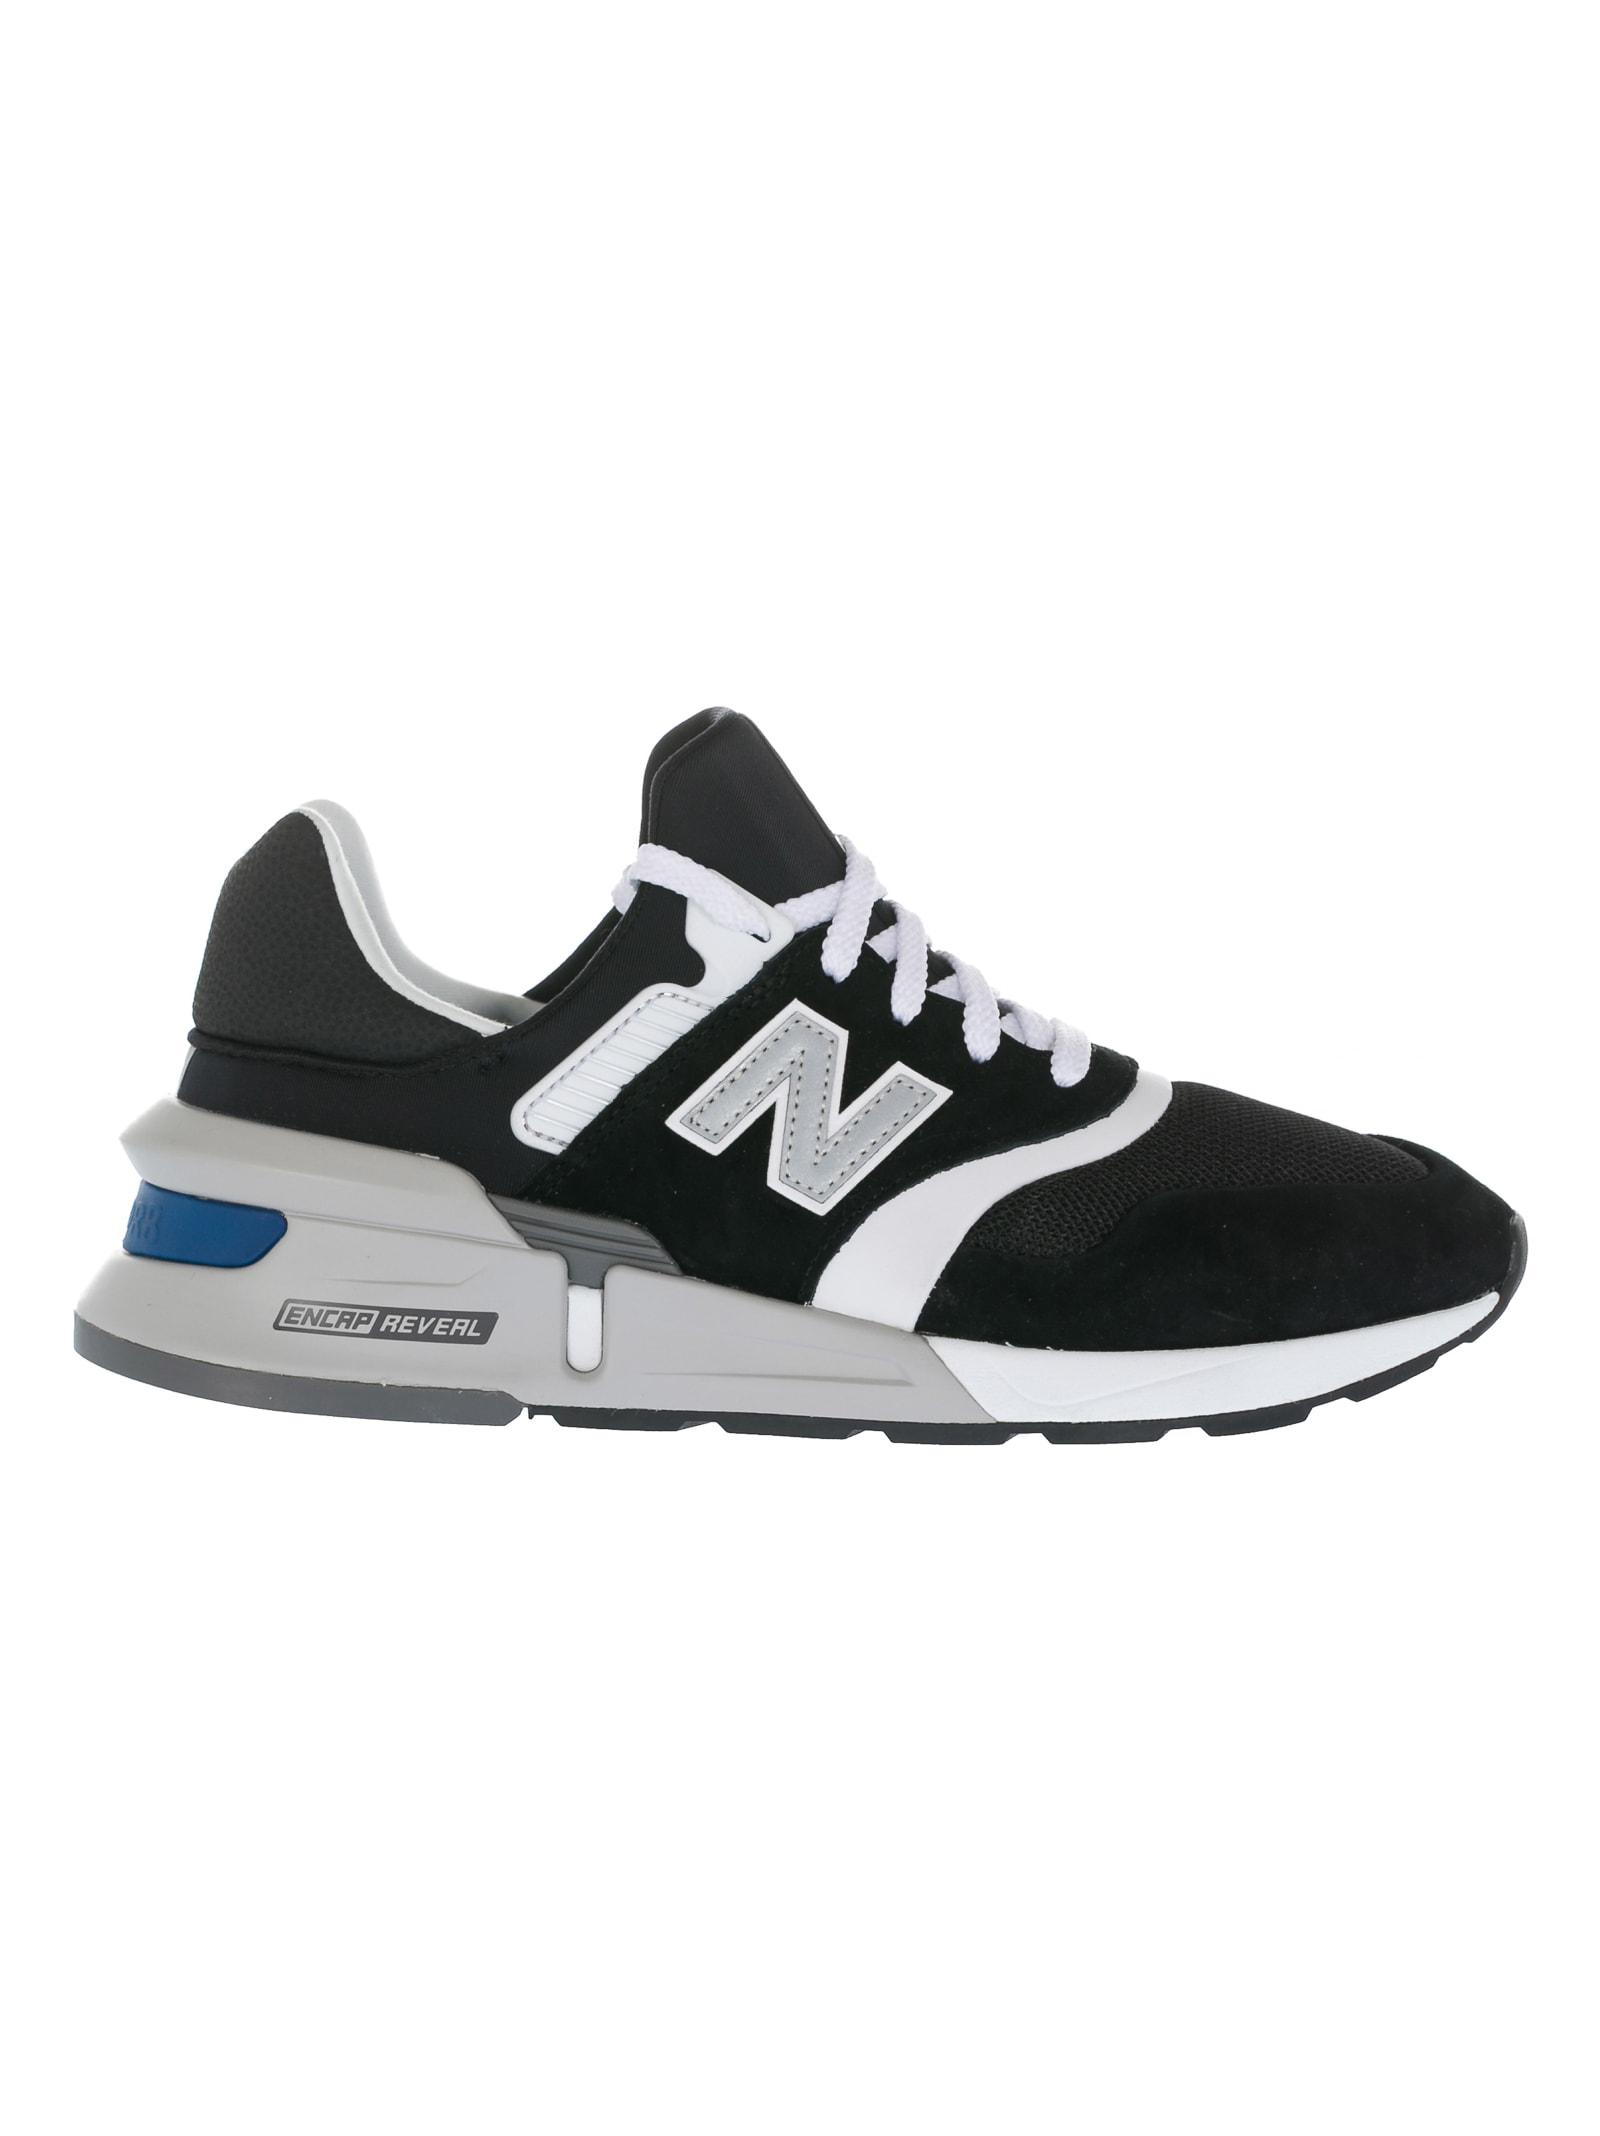 sale retailer d48f1 d1fe2 New Balance 997 Sport Sneakers